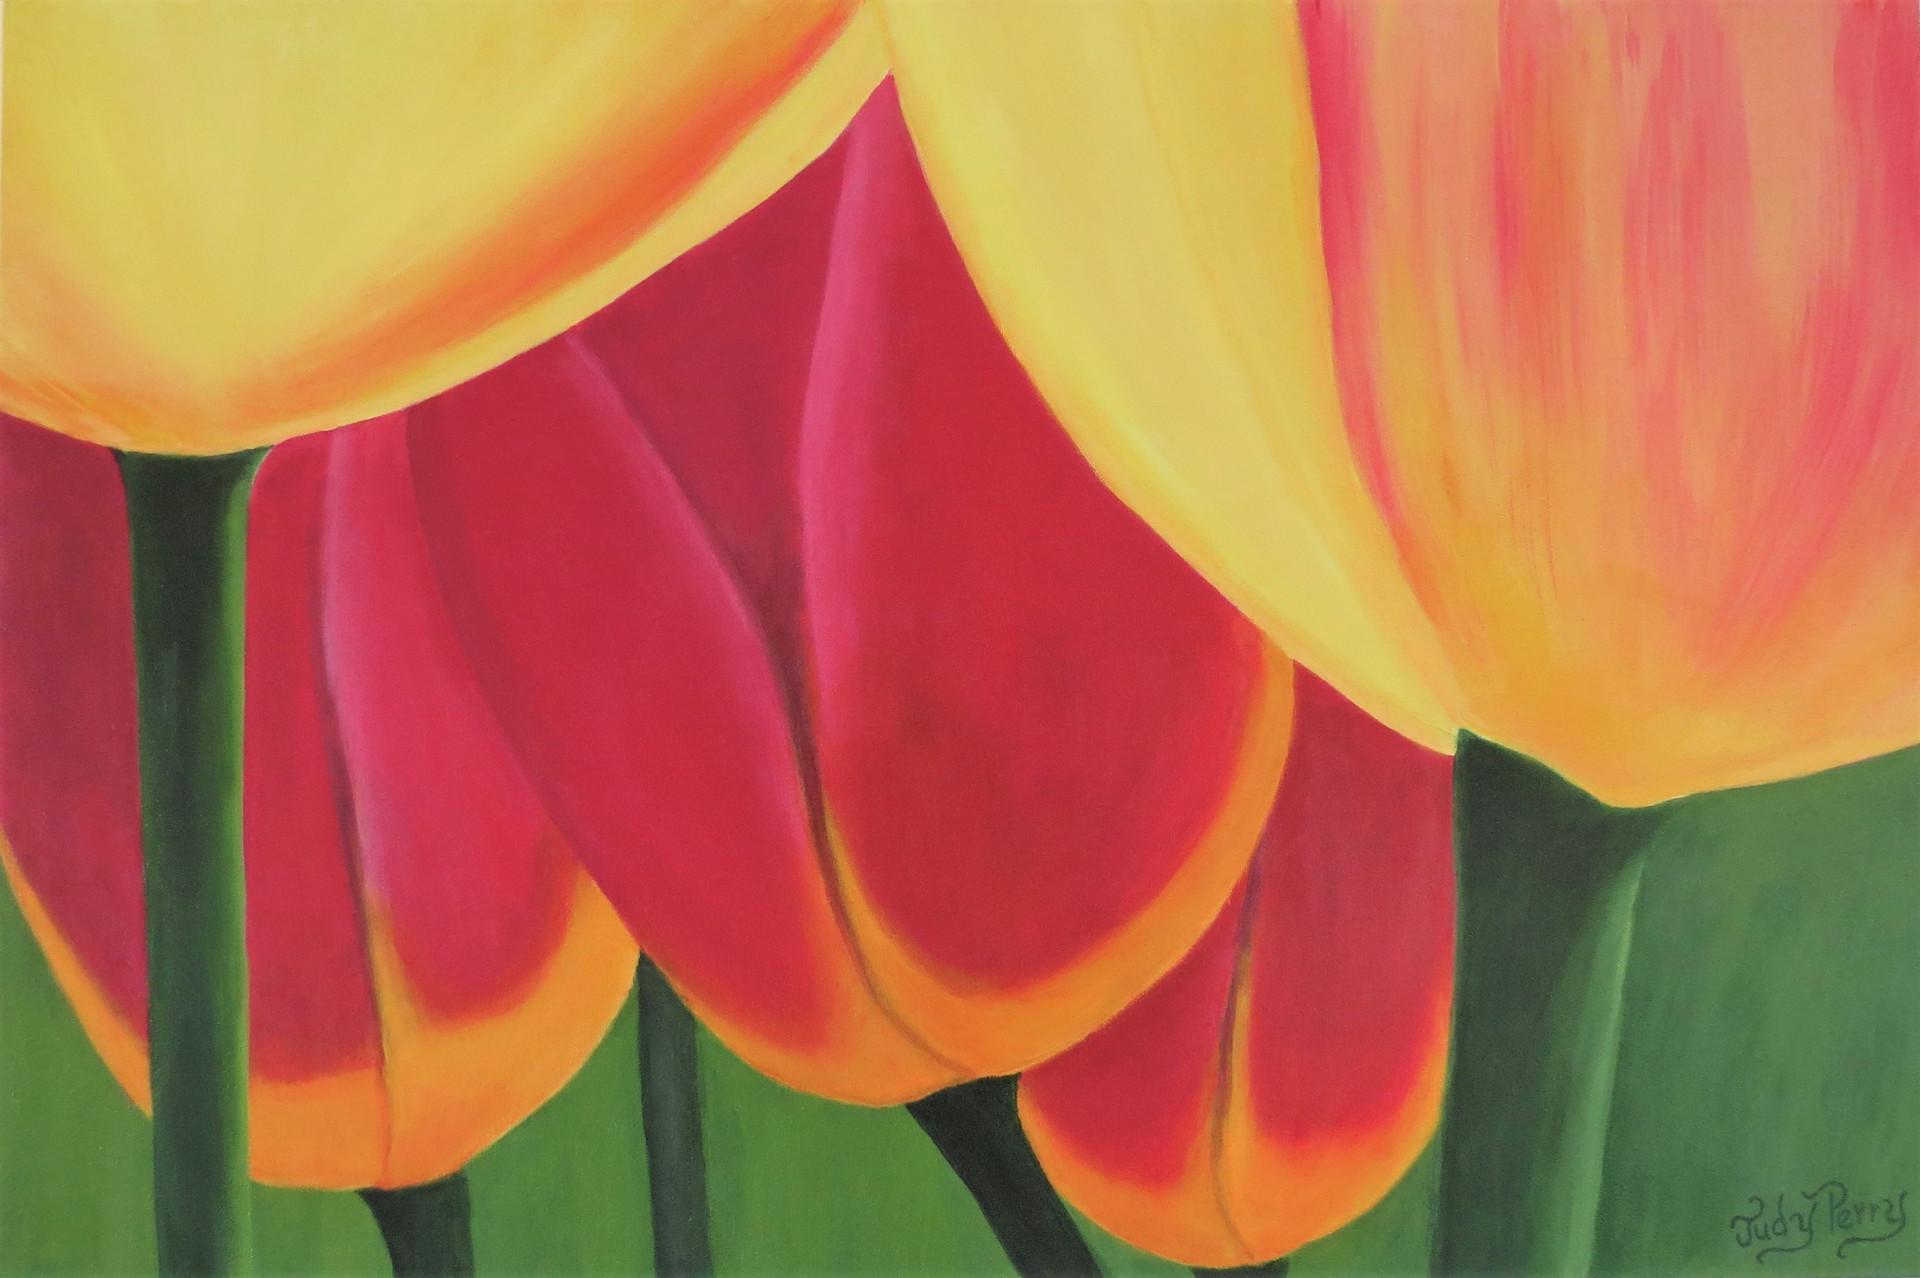 Tulip Sky 24x36 - Sold